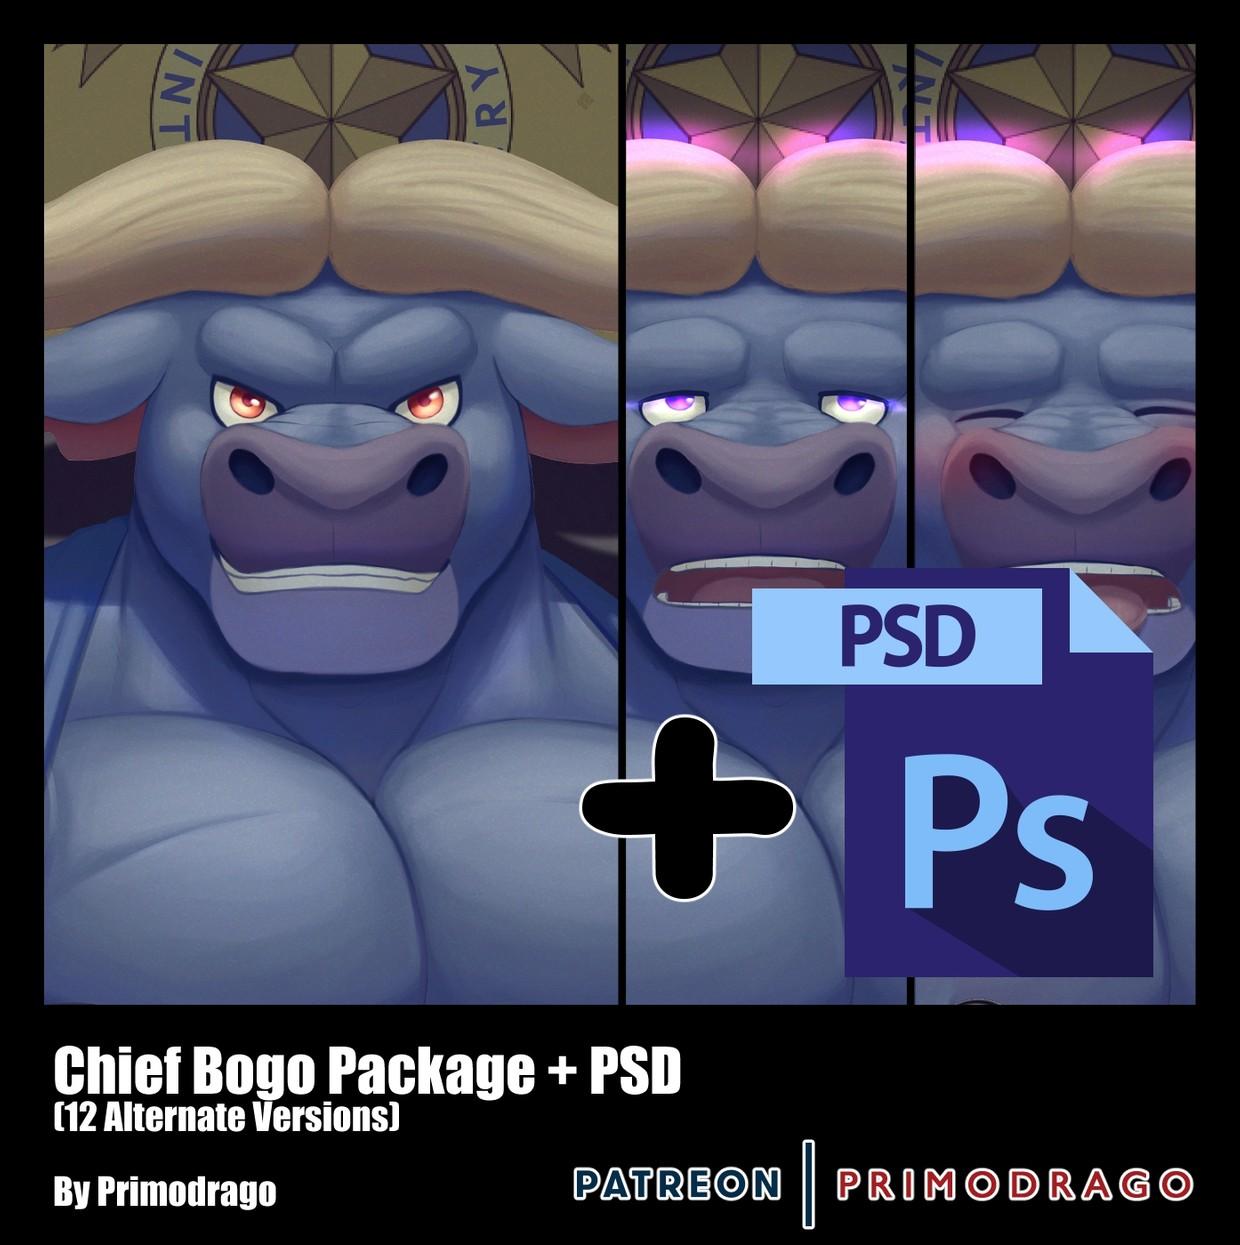 Chief Bogo Artpack + PSD File